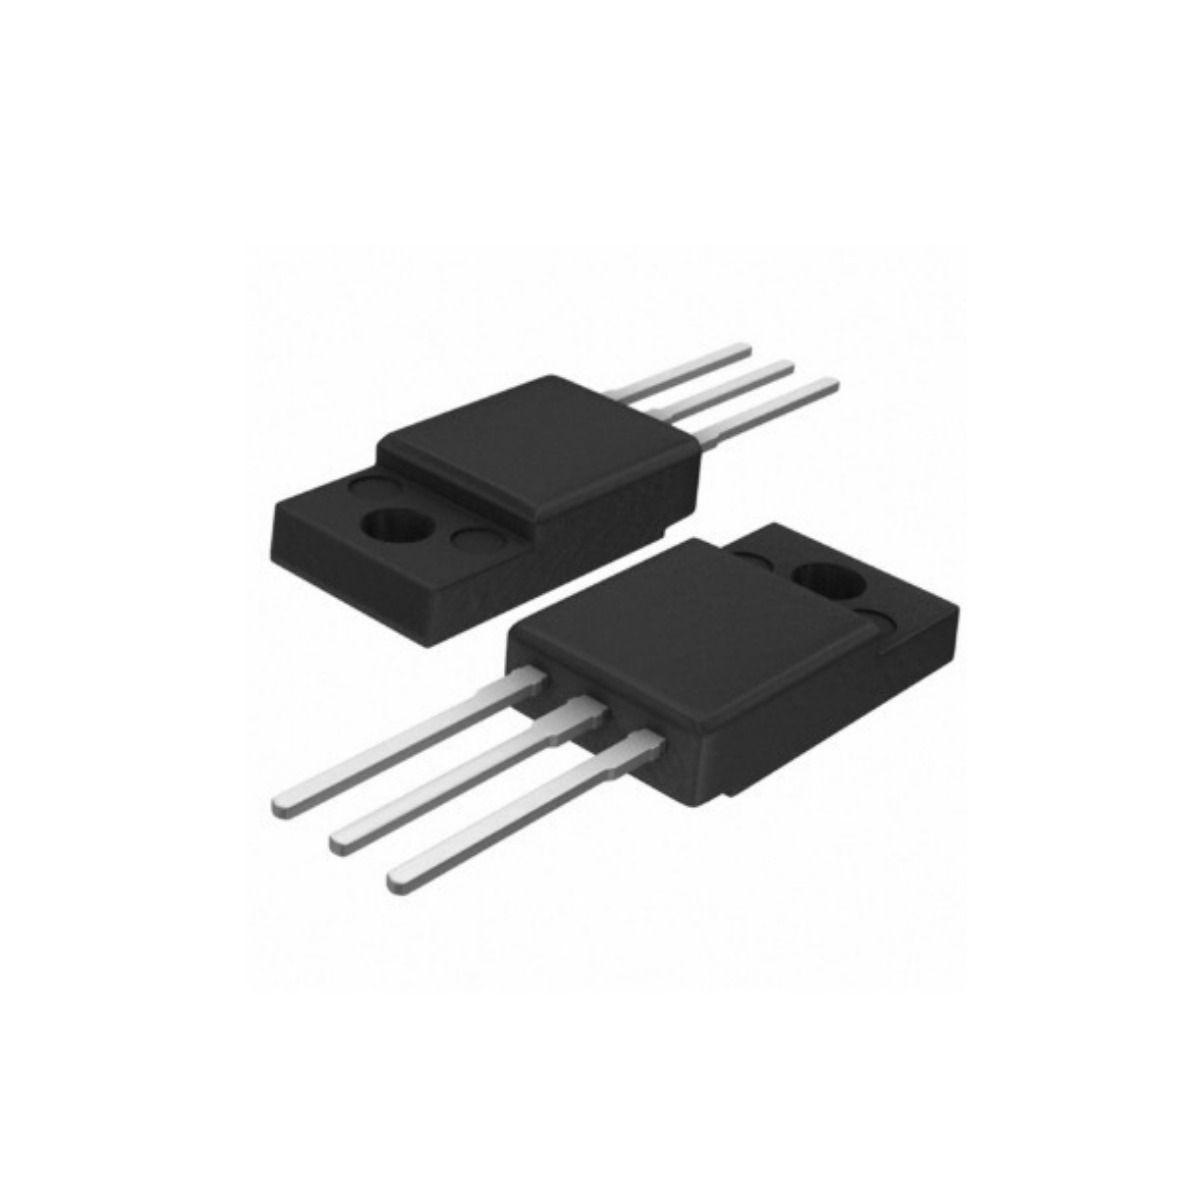 5 Peças Transistor SMD60N3 STD60N3LHS T0525 Dpak 30v 48A